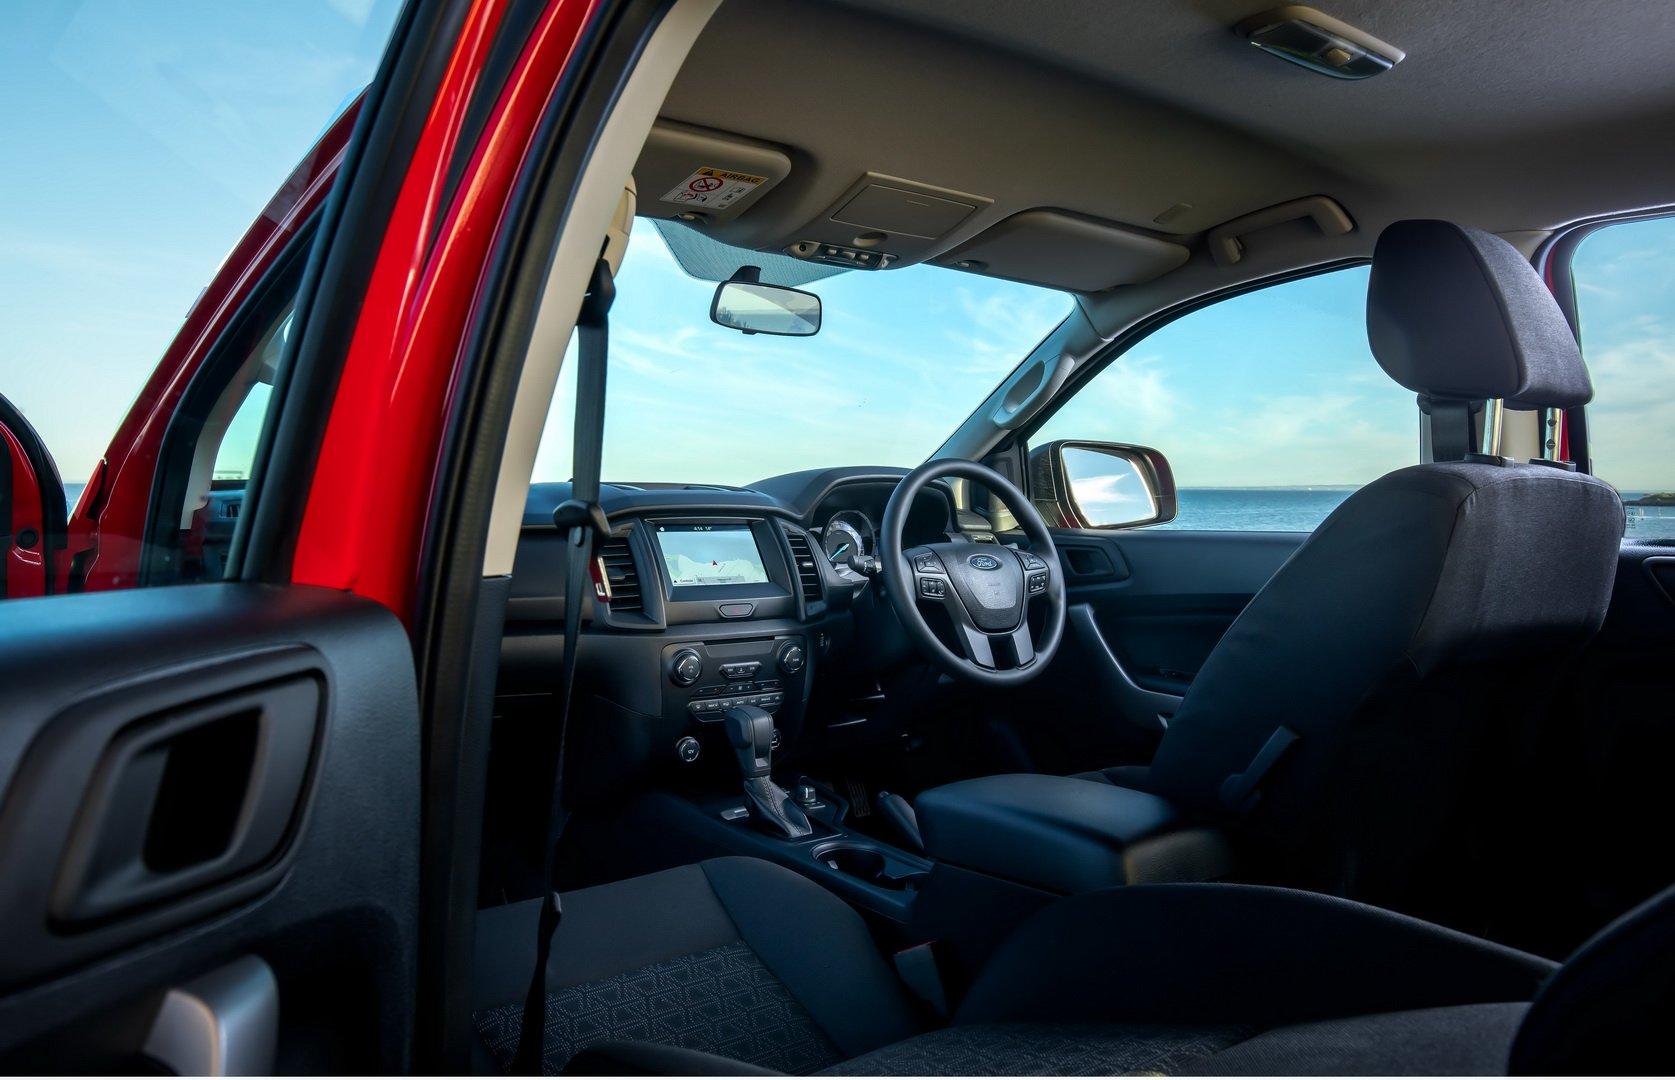 2019-ford-ranger-sport-special-edition-australia-9.jpg